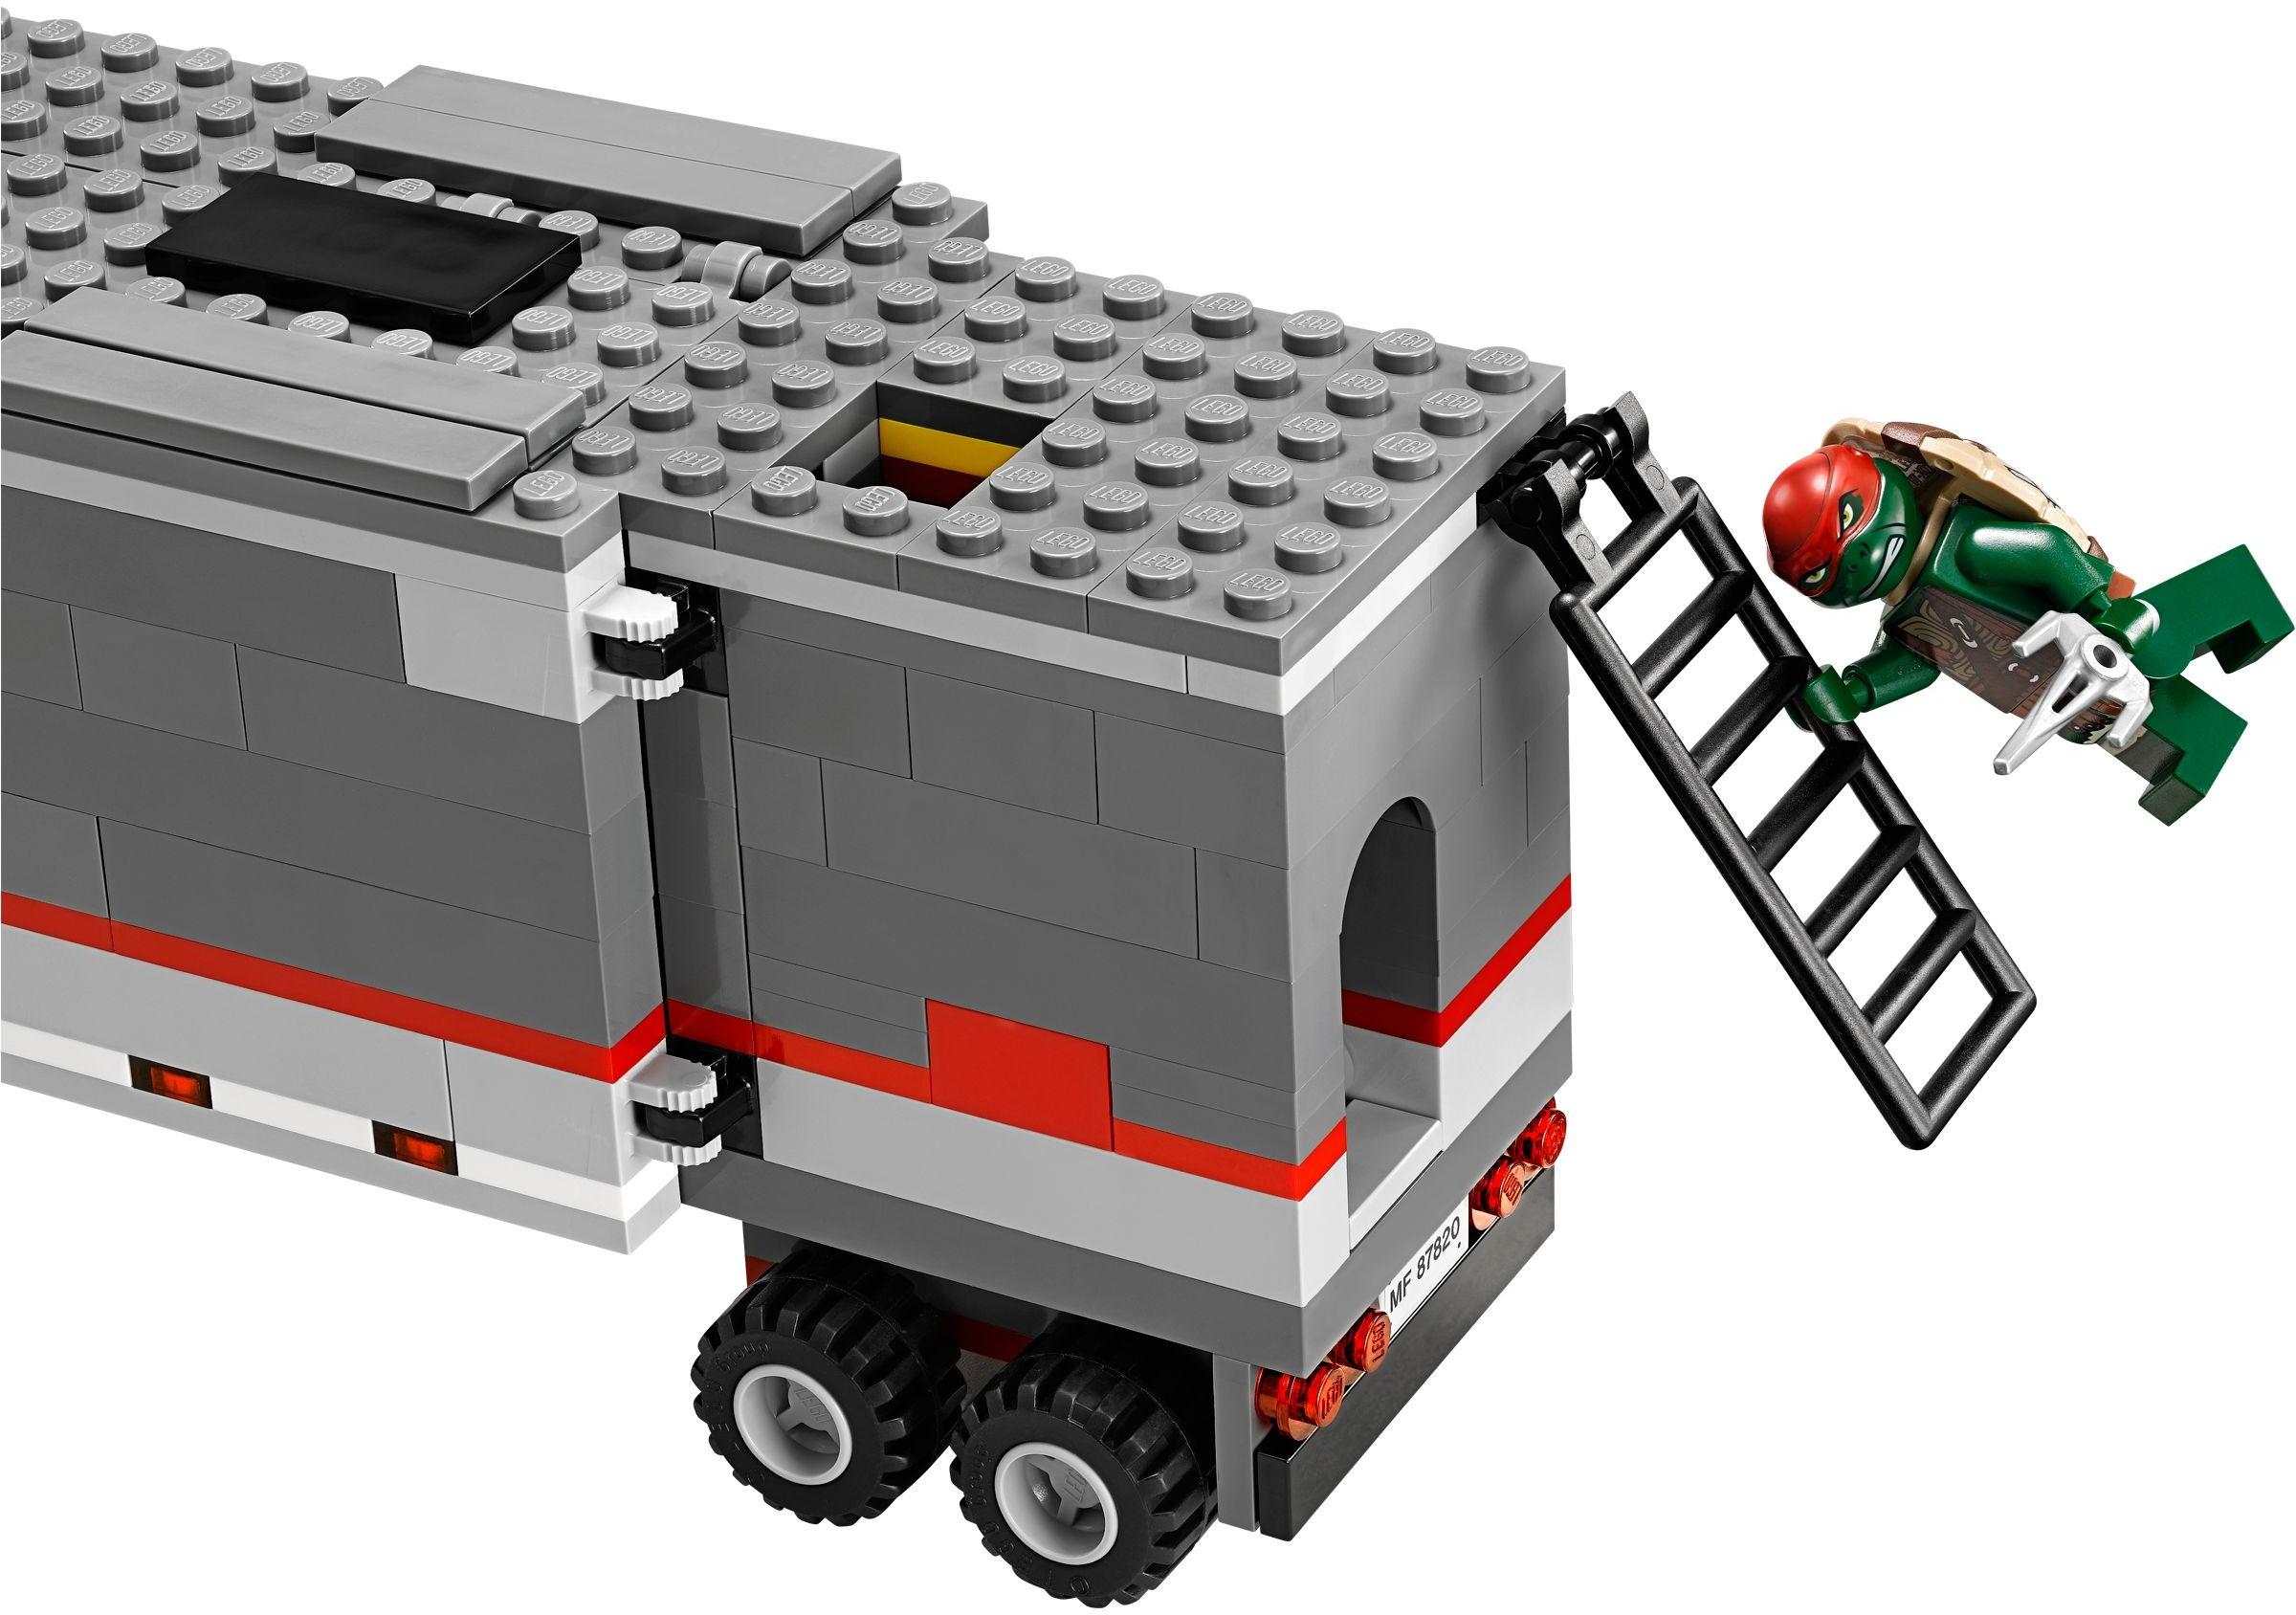 LEGO Tortues Ninja 79116 Pas Cher